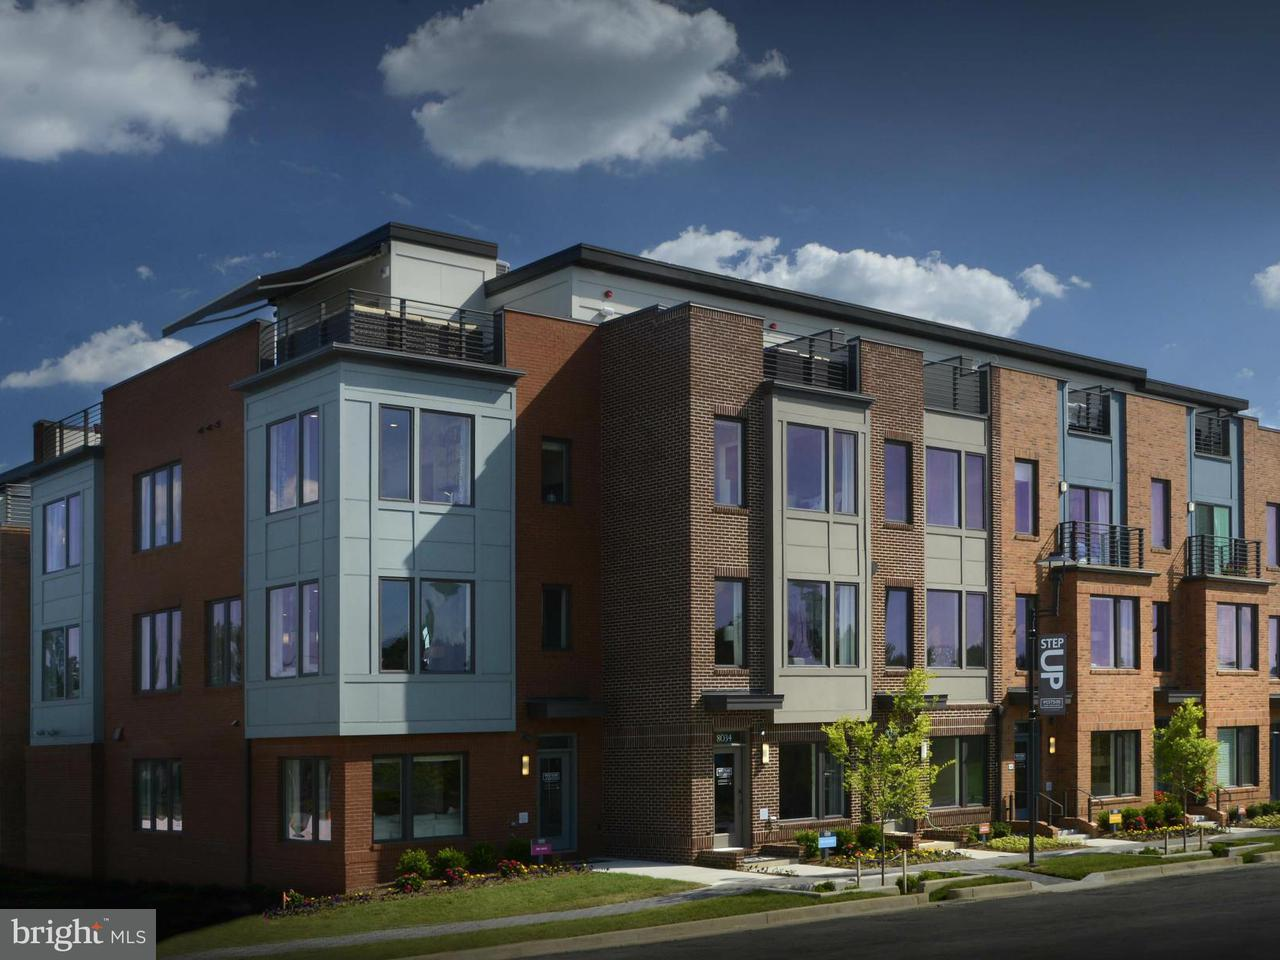 Townhouse for Sale at 8030 FLATBUSH ST #DAVIS MODEL HOME 8030 FLATBUSH ST #DAVIS MODEL HOME Rockville, Maryland 20855 United States